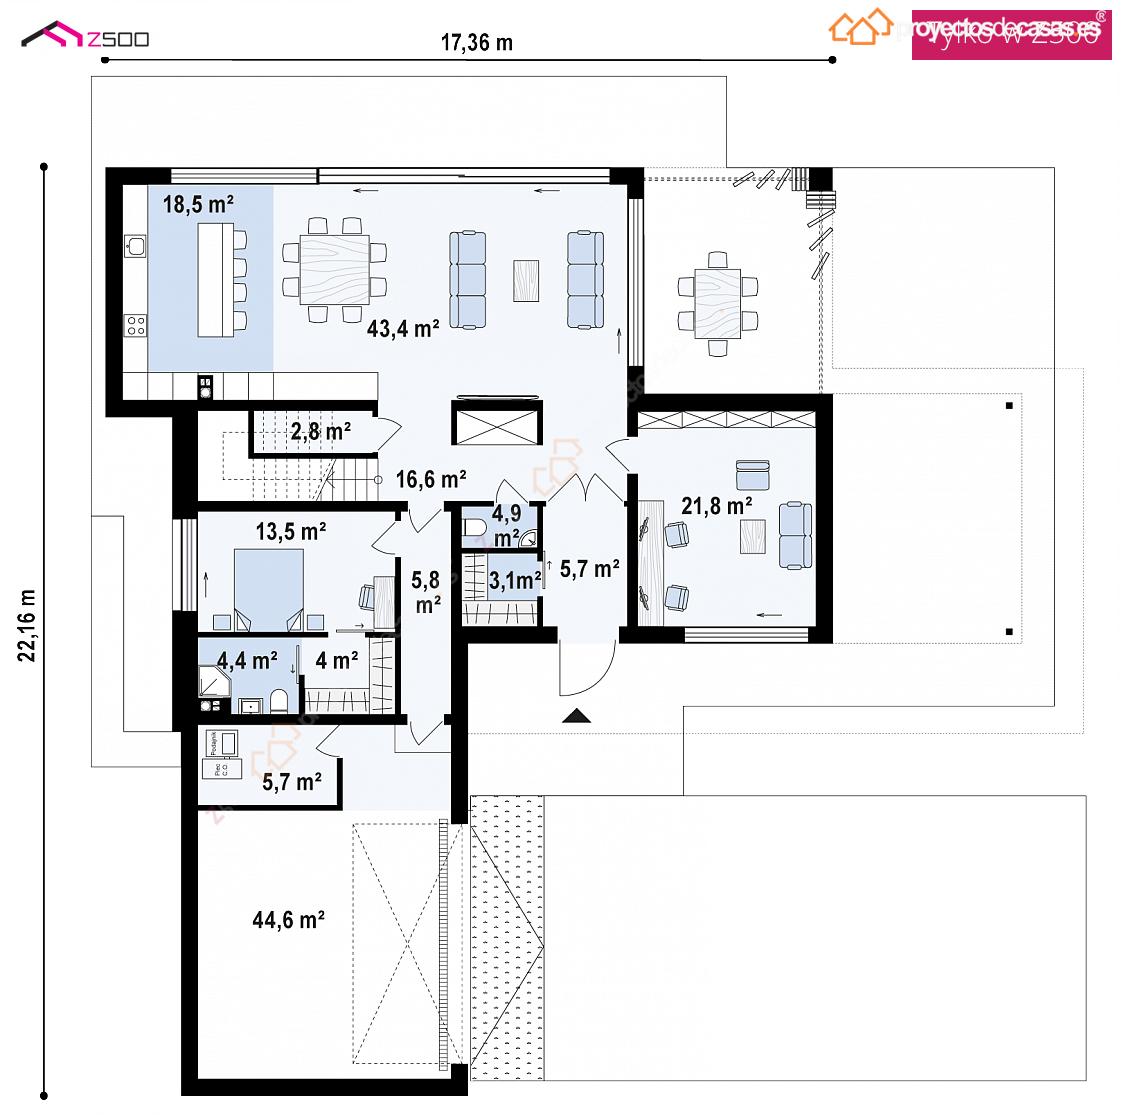 Planos casa planta baja good casa baja with planos casa for Casa moderna planta baja